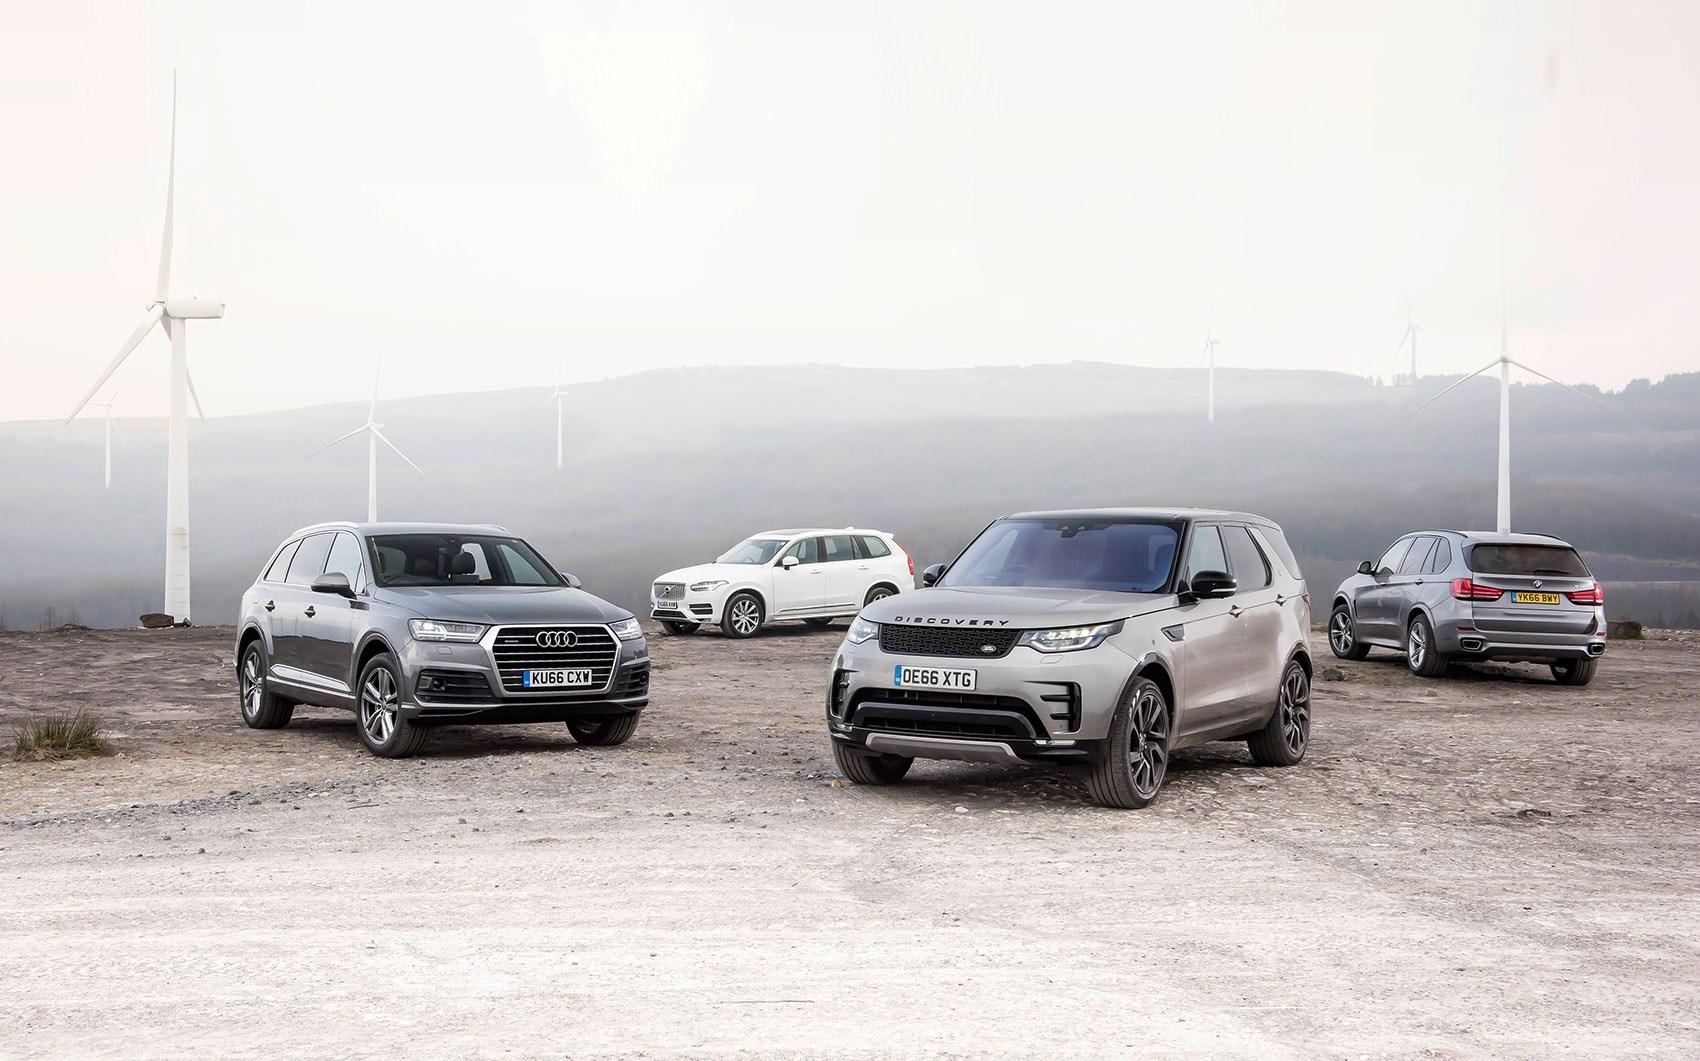 Land Rover Discovery Vs Audi Q7 Vs Bmw X5 Vs Volvo Xc90